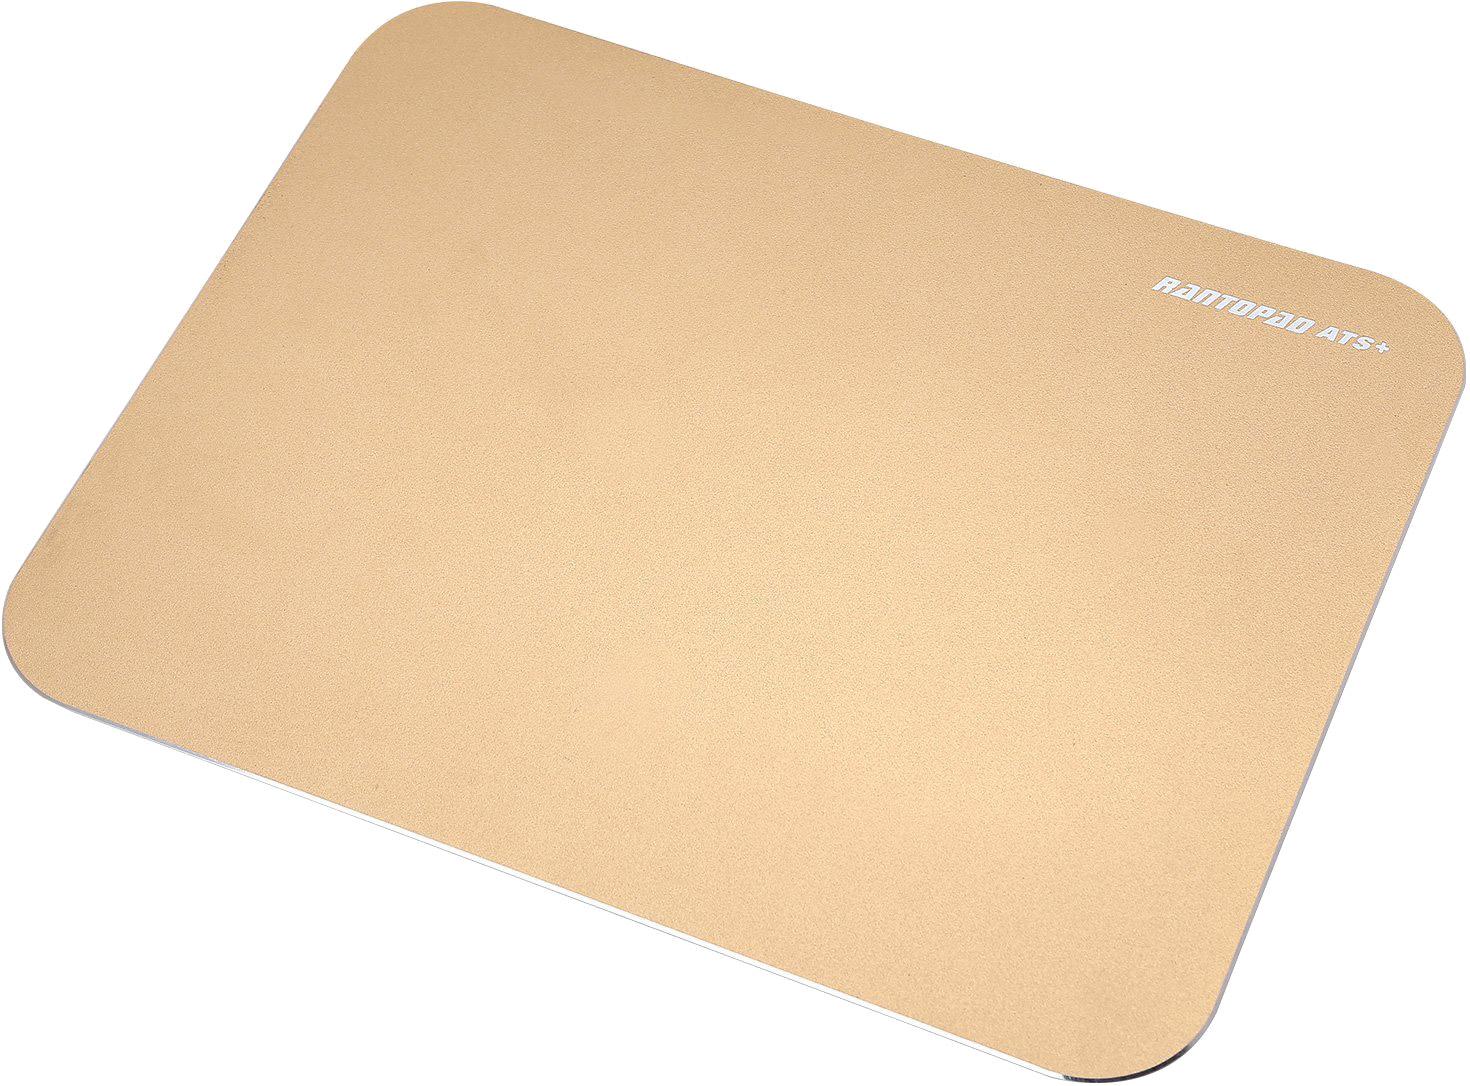 Rantopad gold mouse pad